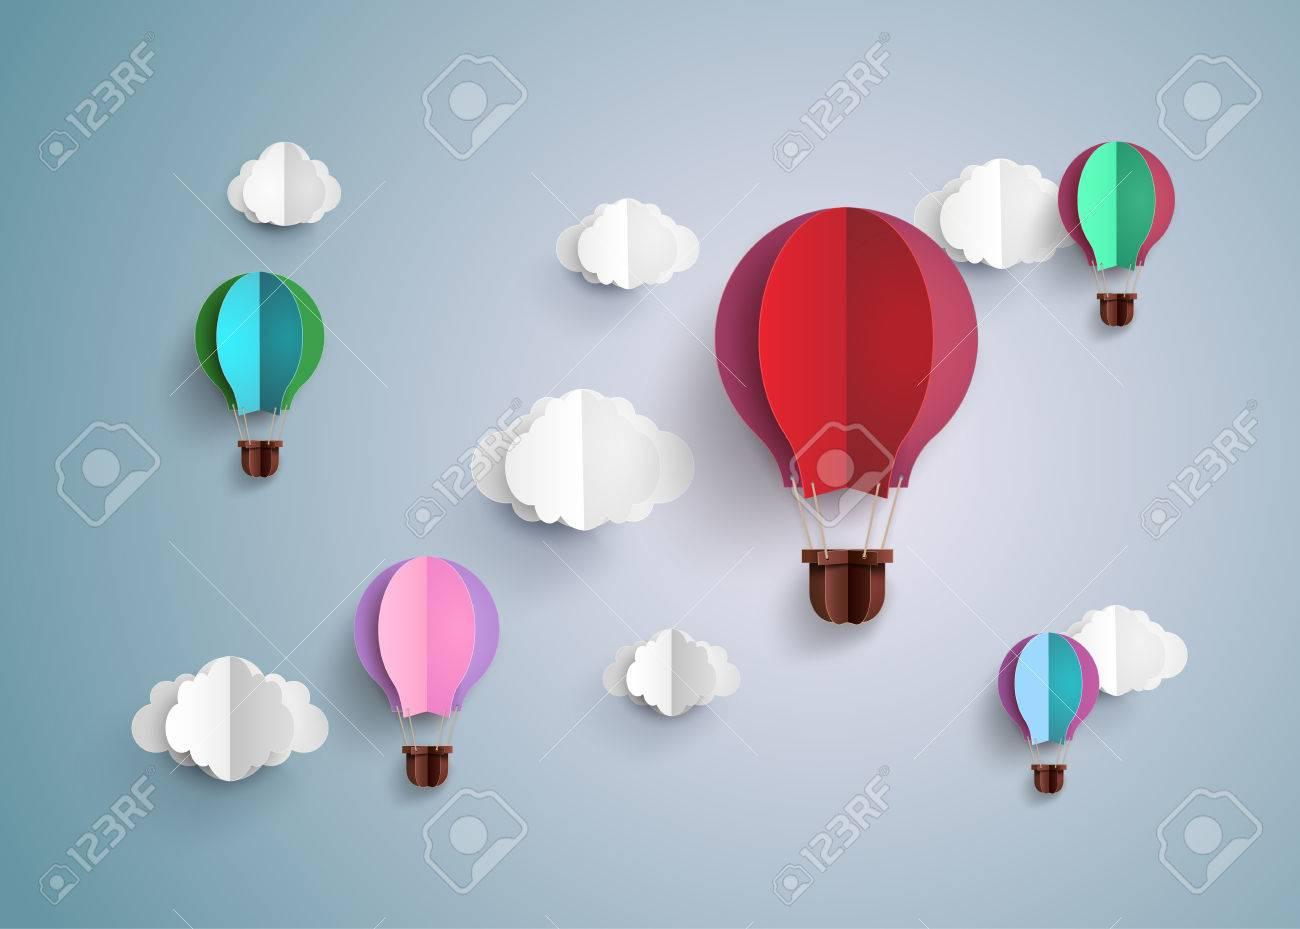 Origami made hot air balloon and cloud royalty free cliparts origami made hot air balloon and cloud stock vector 54018444 jeuxipadfo Choice Image